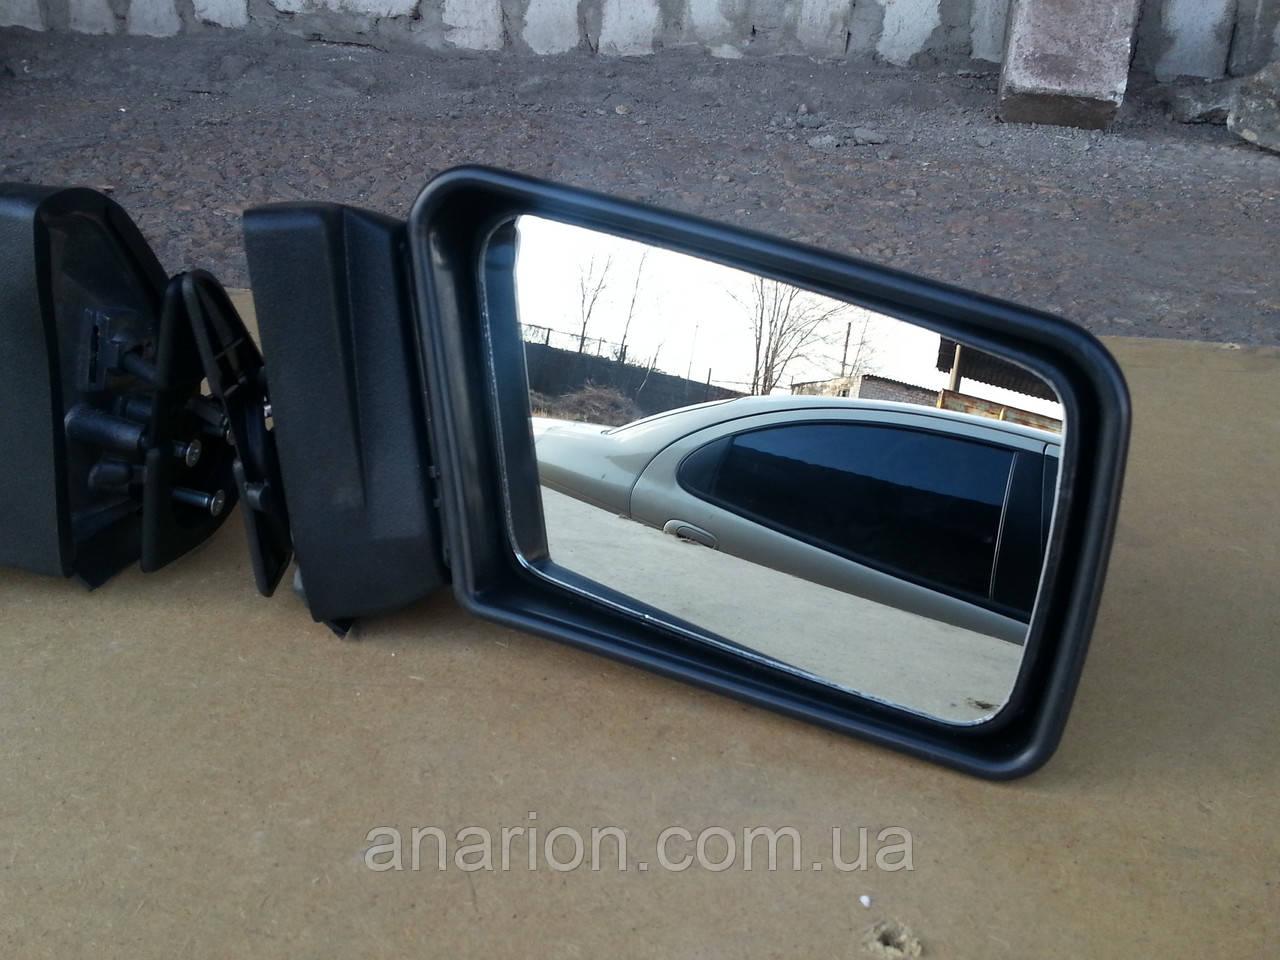 Зеркало боковое на ВАЗ 2107,Таврию,Славуту лукс.